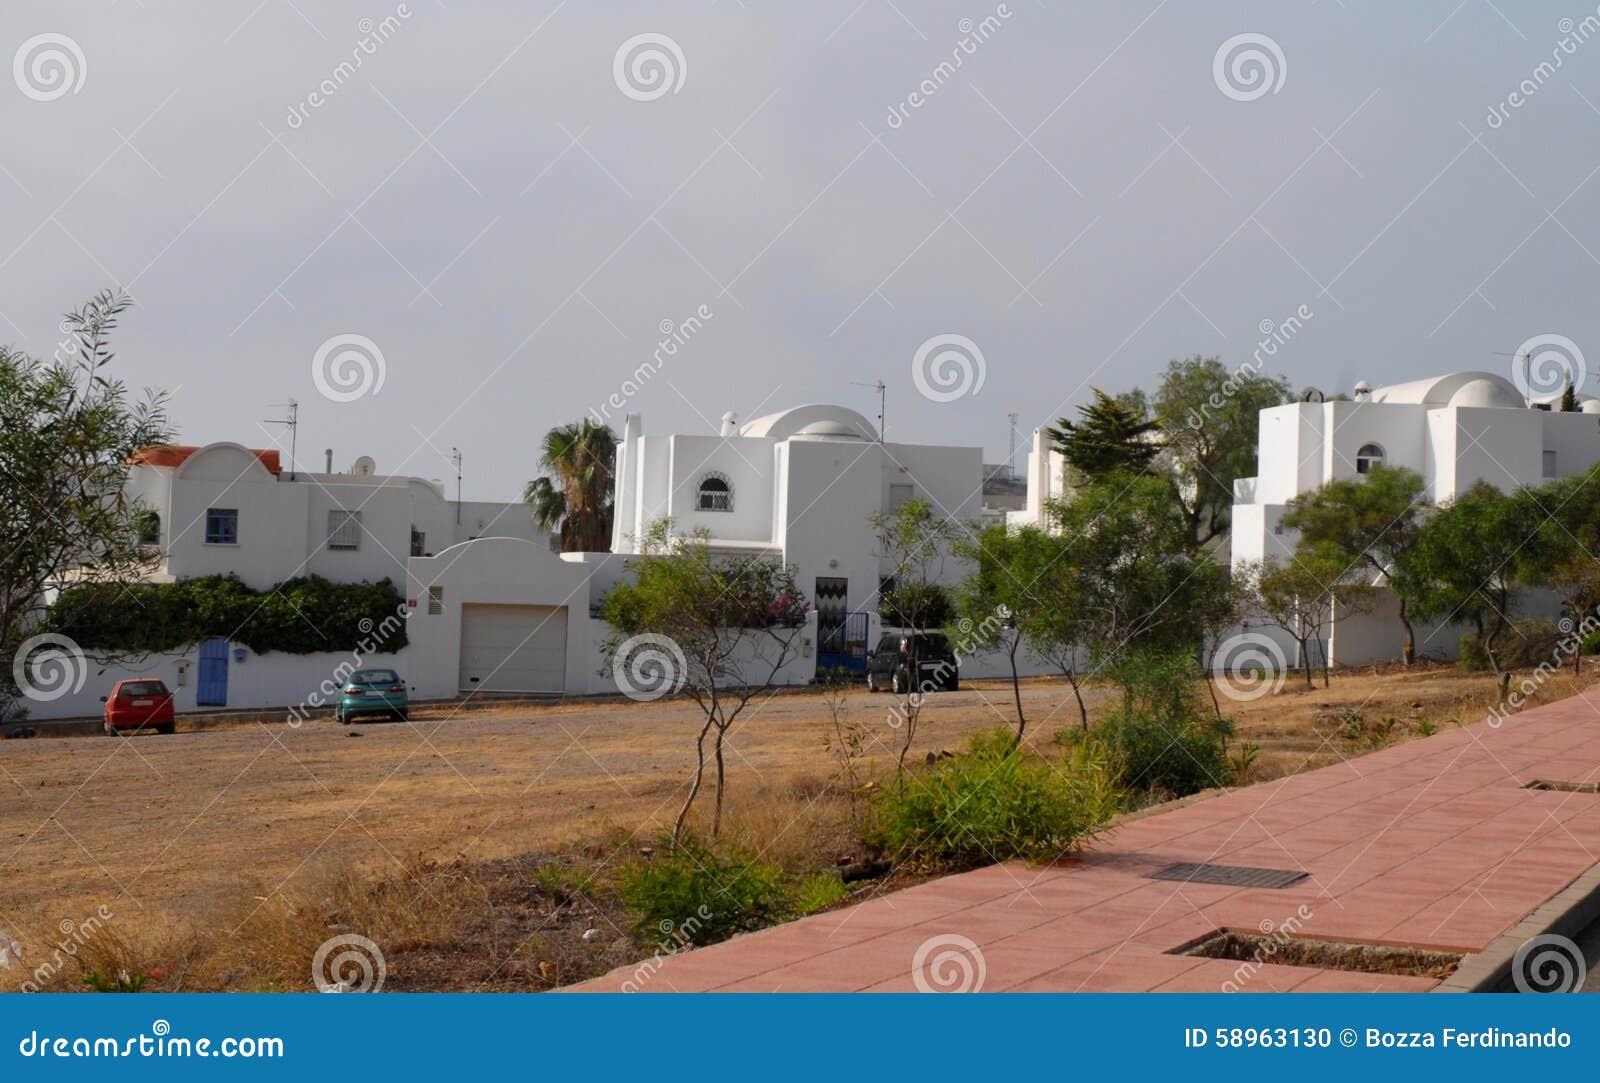 Alcune case bianche moderne vicino a gata bay in andalusia for Case bianche moderne